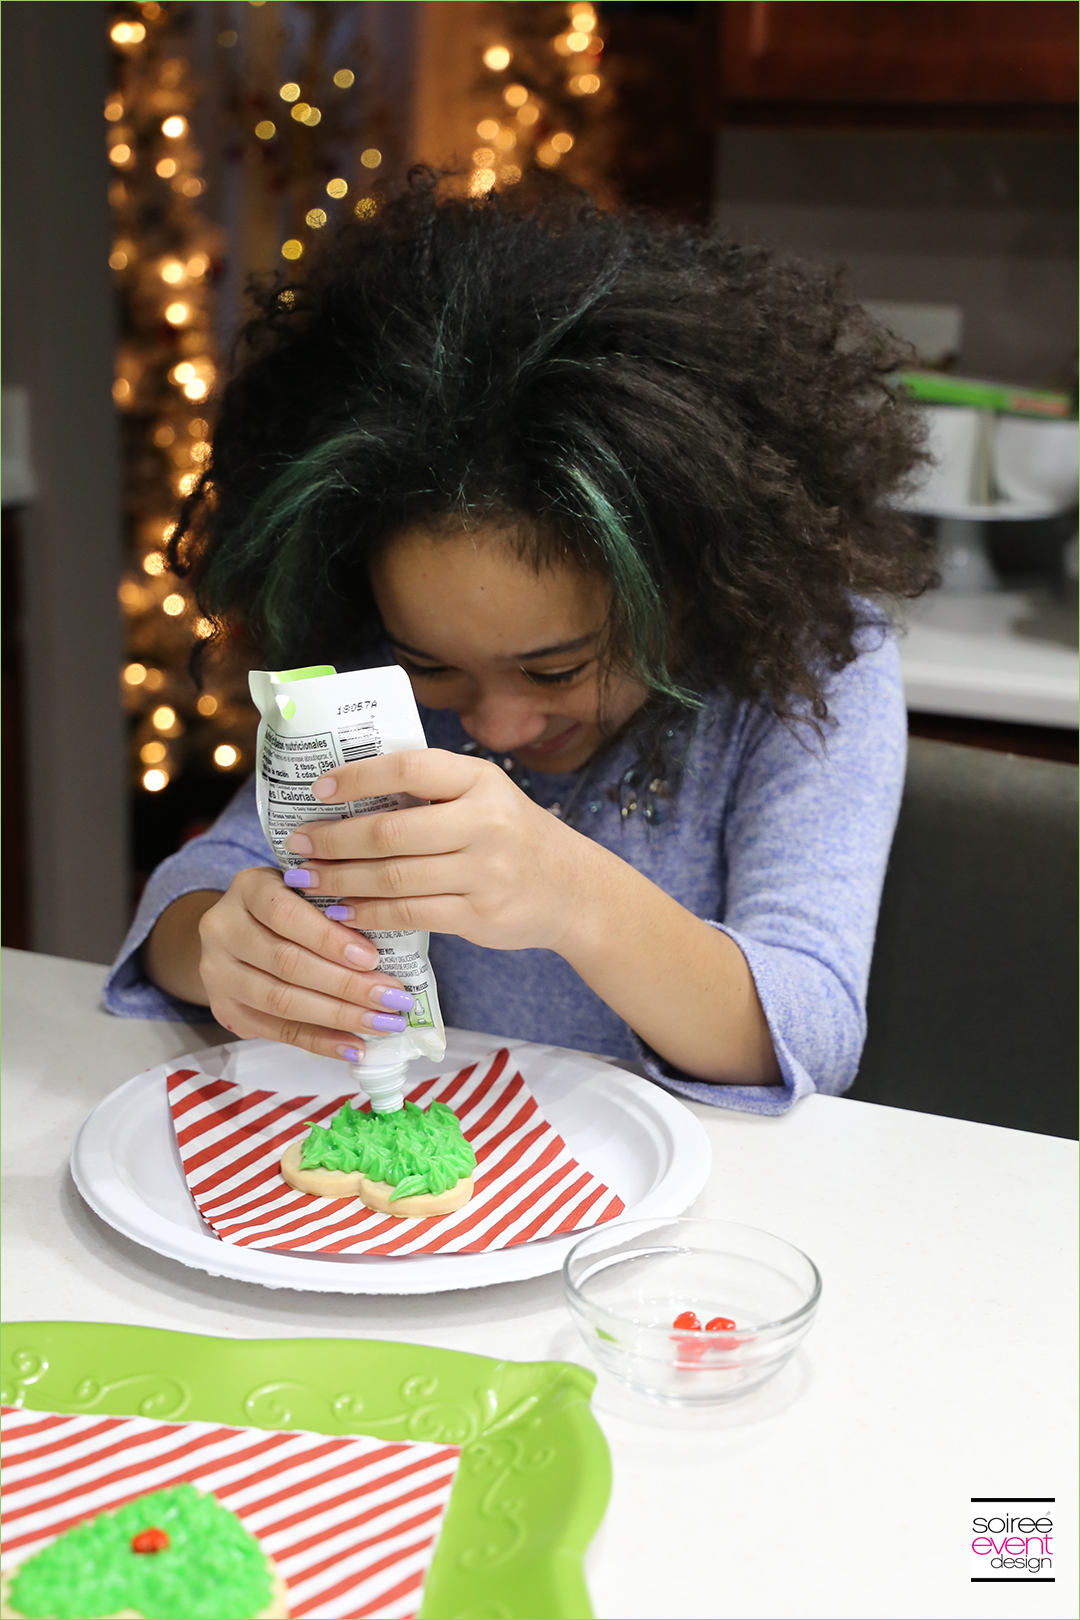 Grinch Dessert Ideas - Grinch Heart Cookies - Step 2A